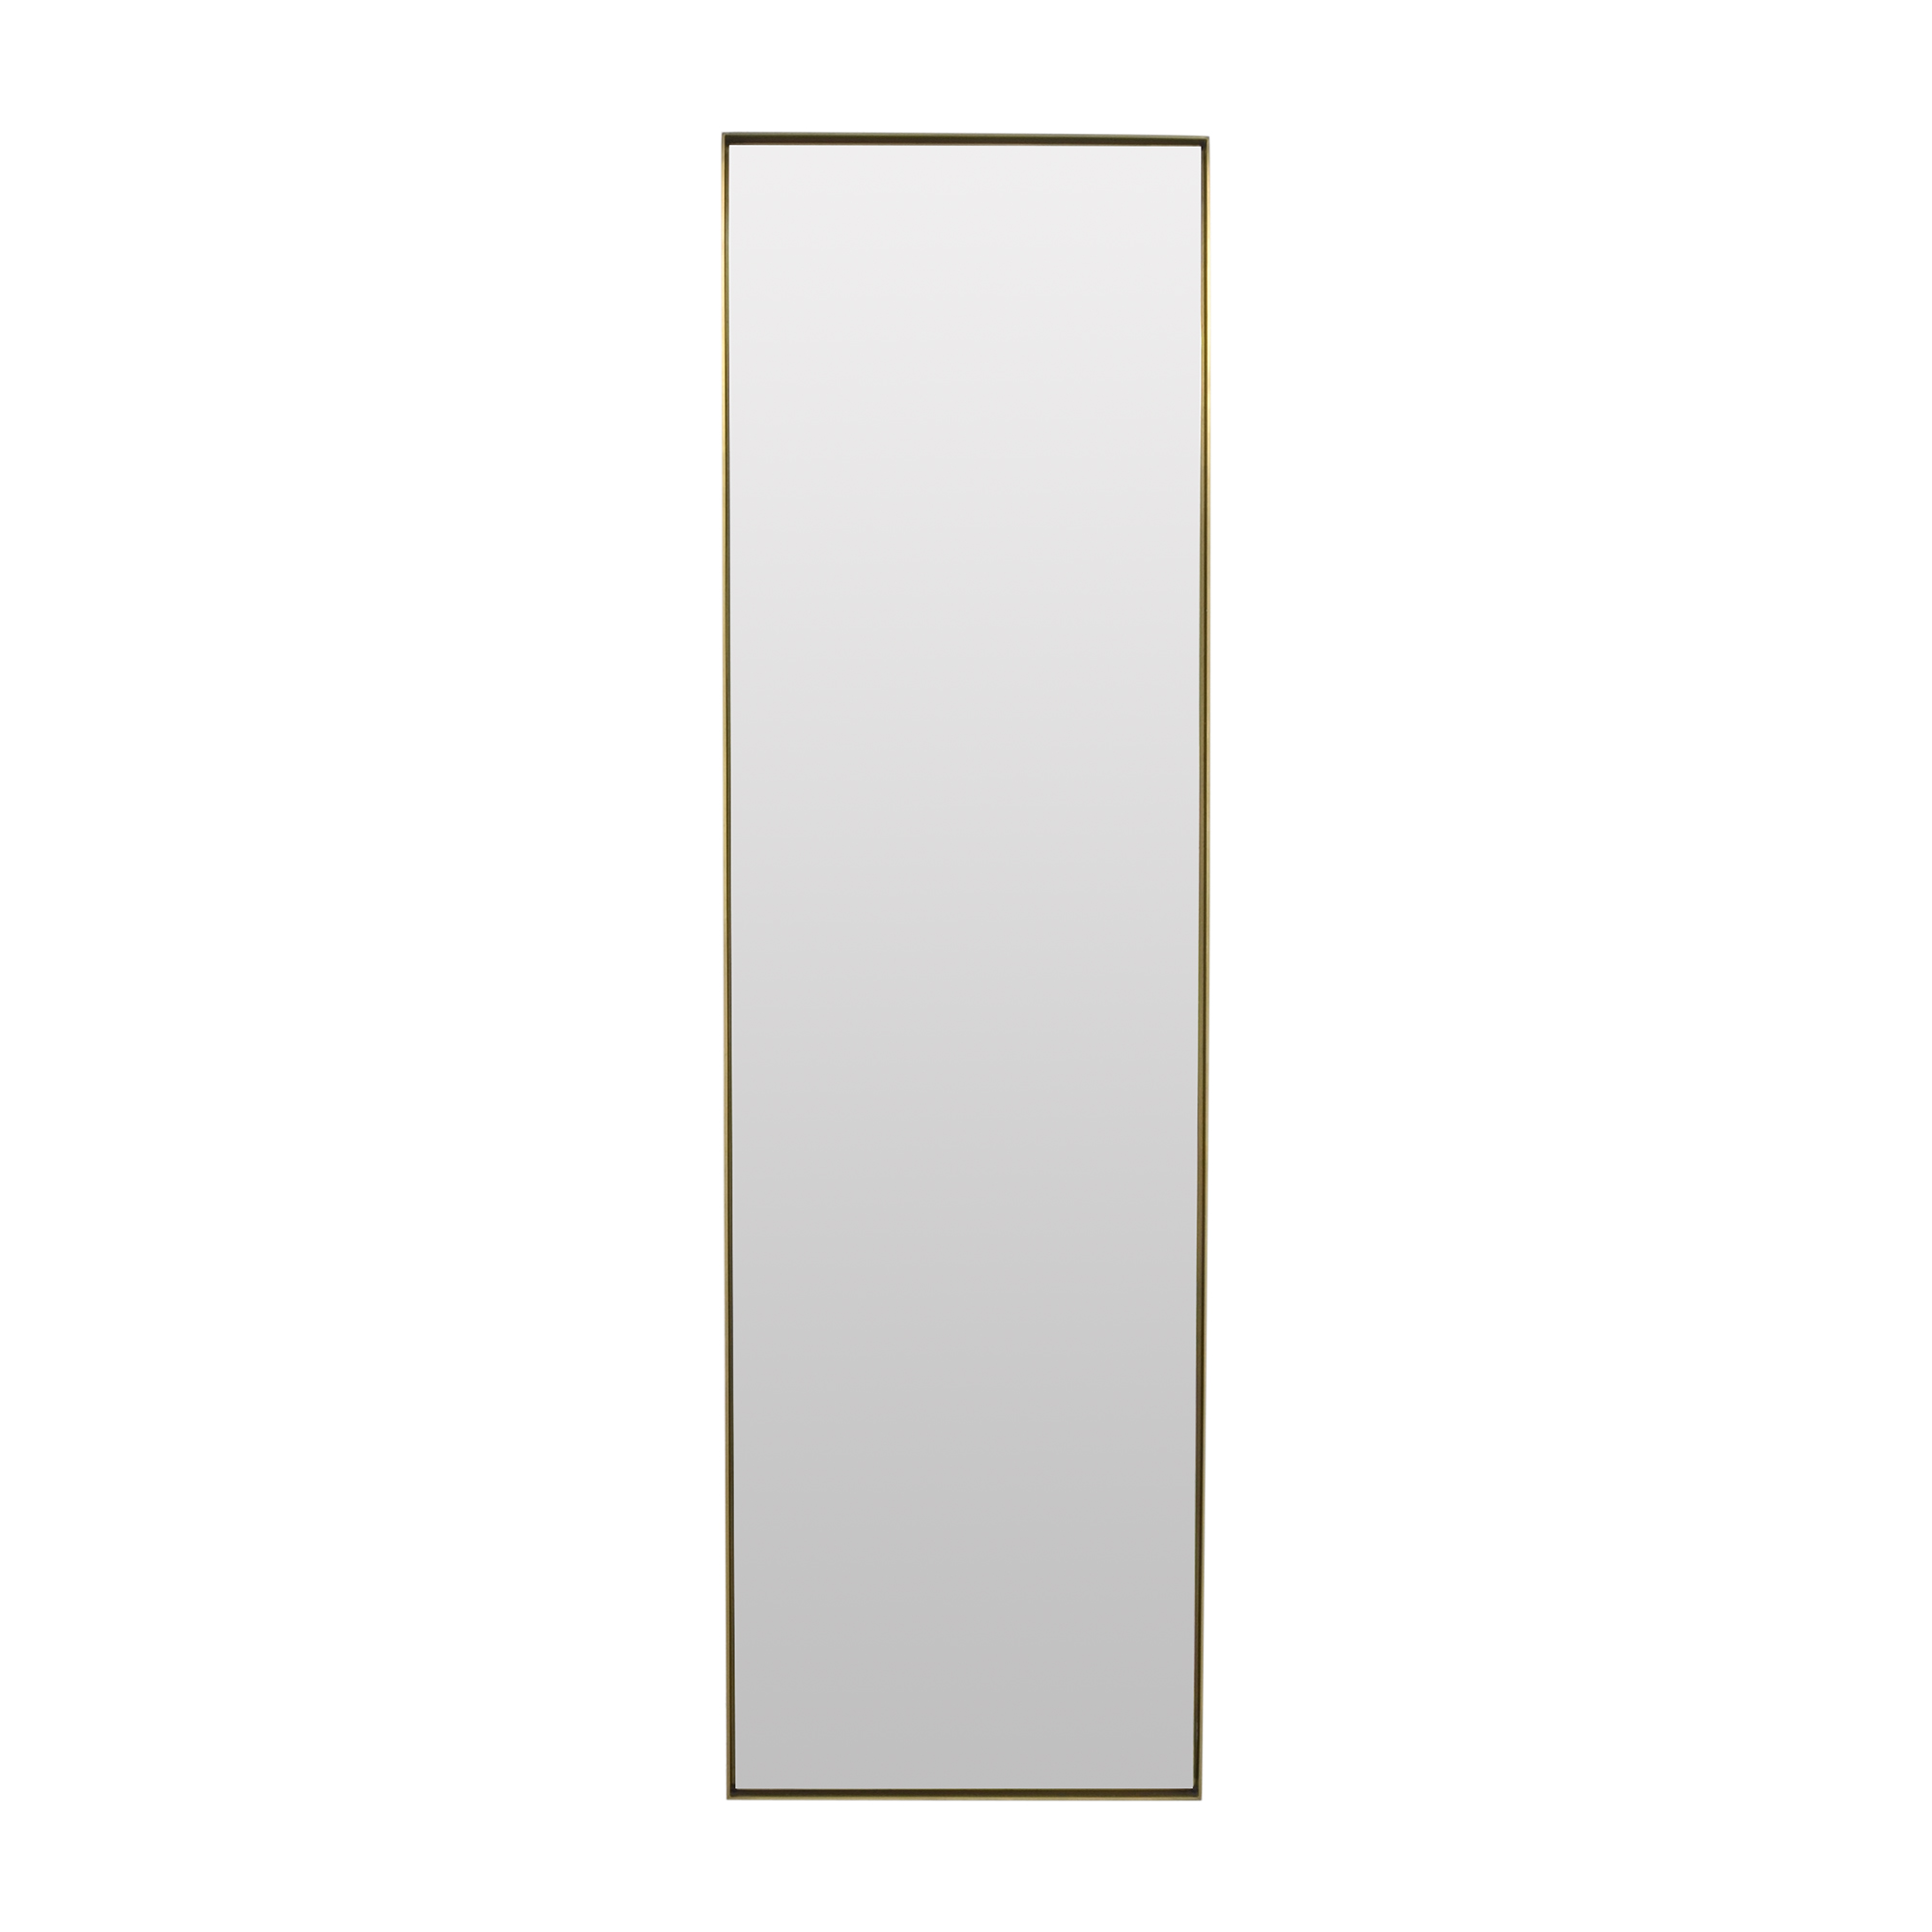 "buy Restoration Hardware Metal Dovetail Leaner Mirror 24"" x 80"" Restoration Hardware Decor"